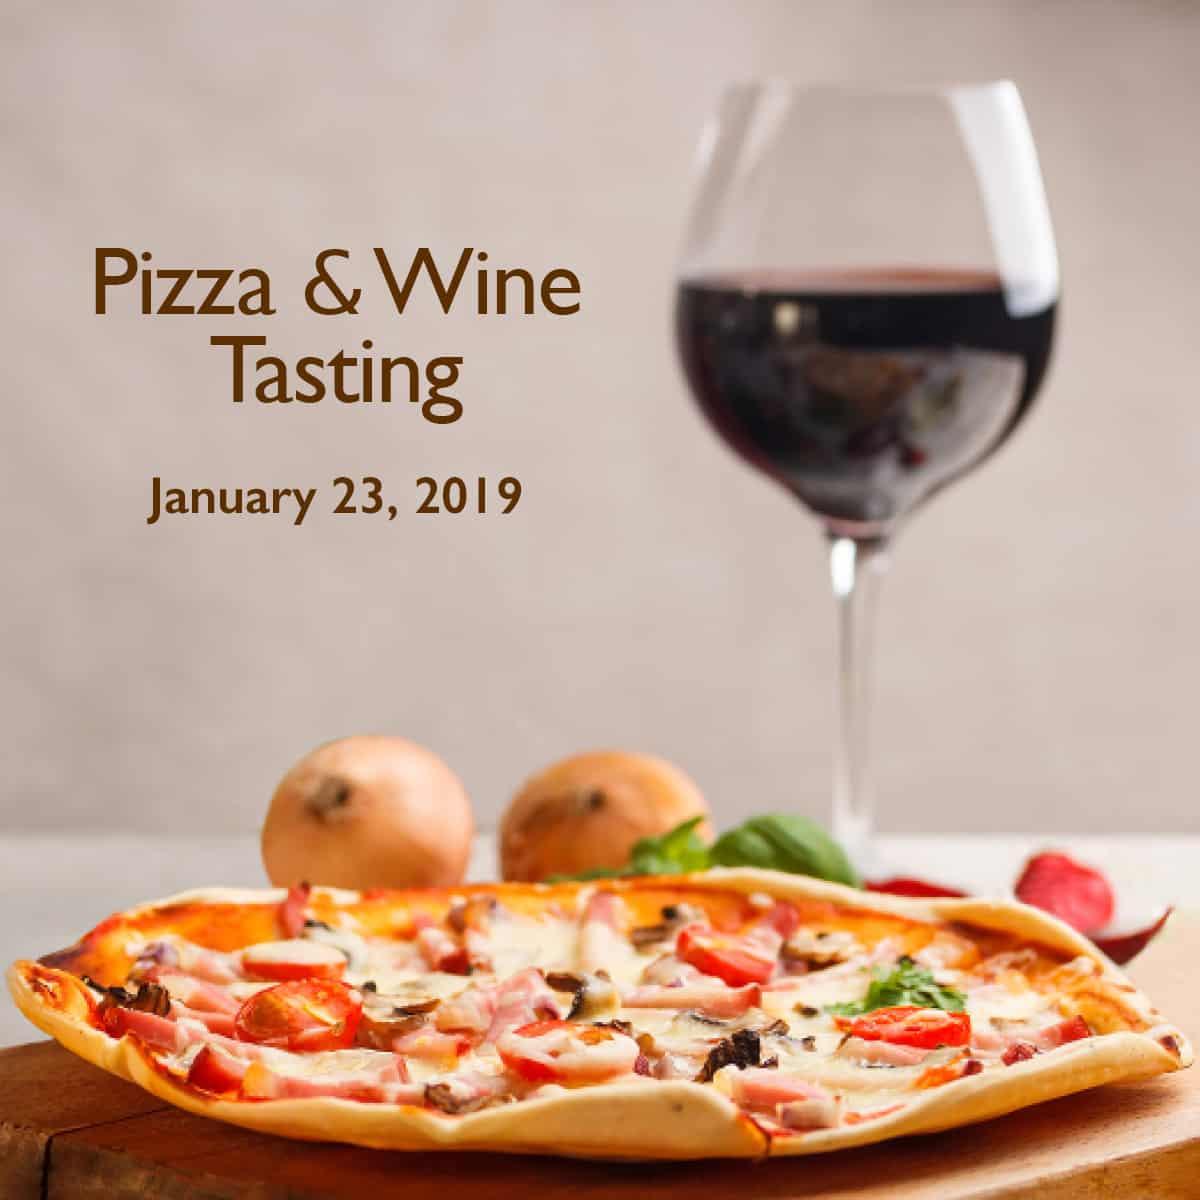 Gorji wine tasting and pizza.